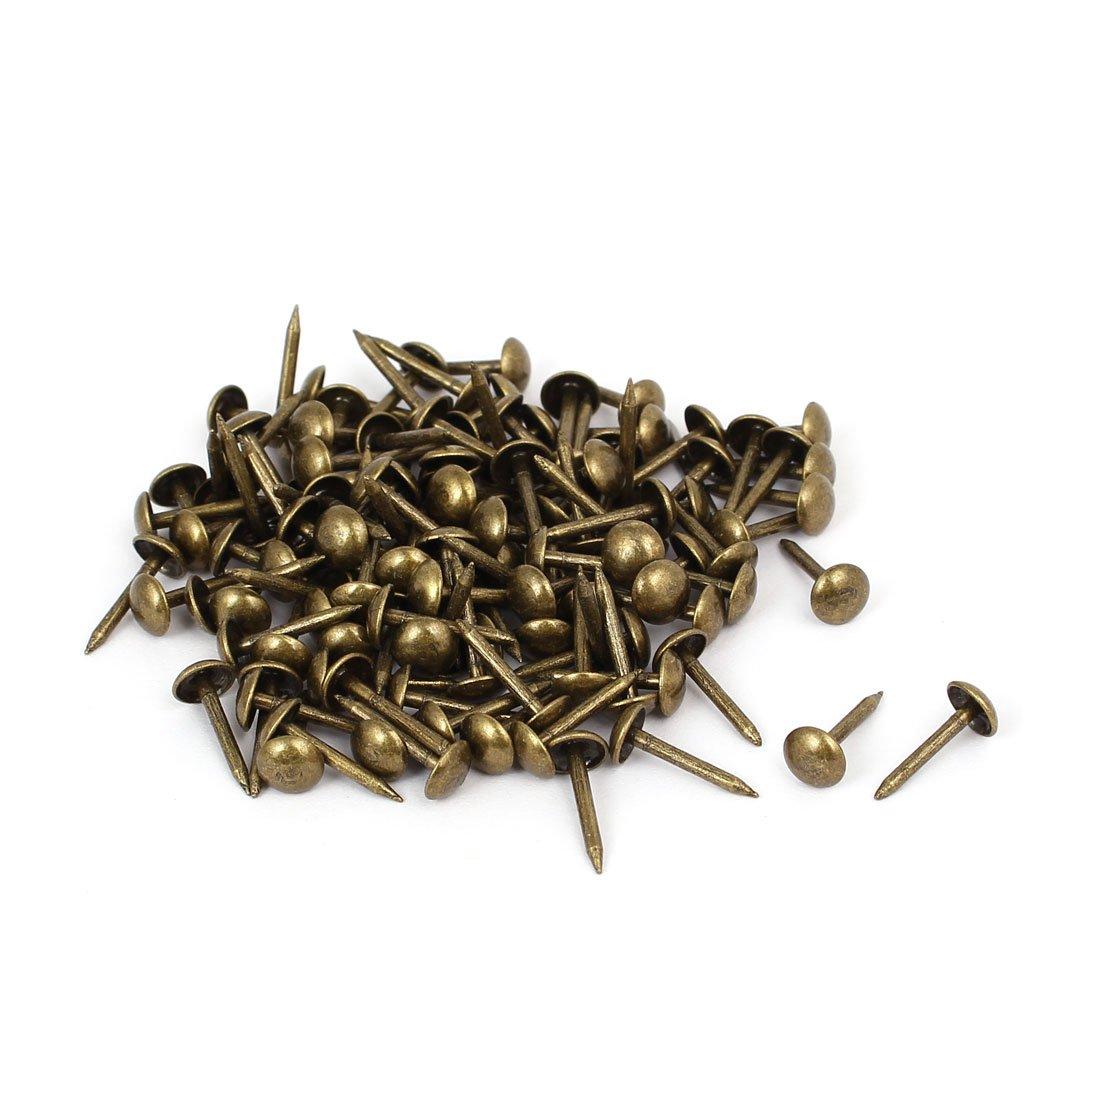 uxcell Home Furniture 6mm x 14mm Upholstery Thumb Tack Nail Push Pin Bronze Tone 120pcs